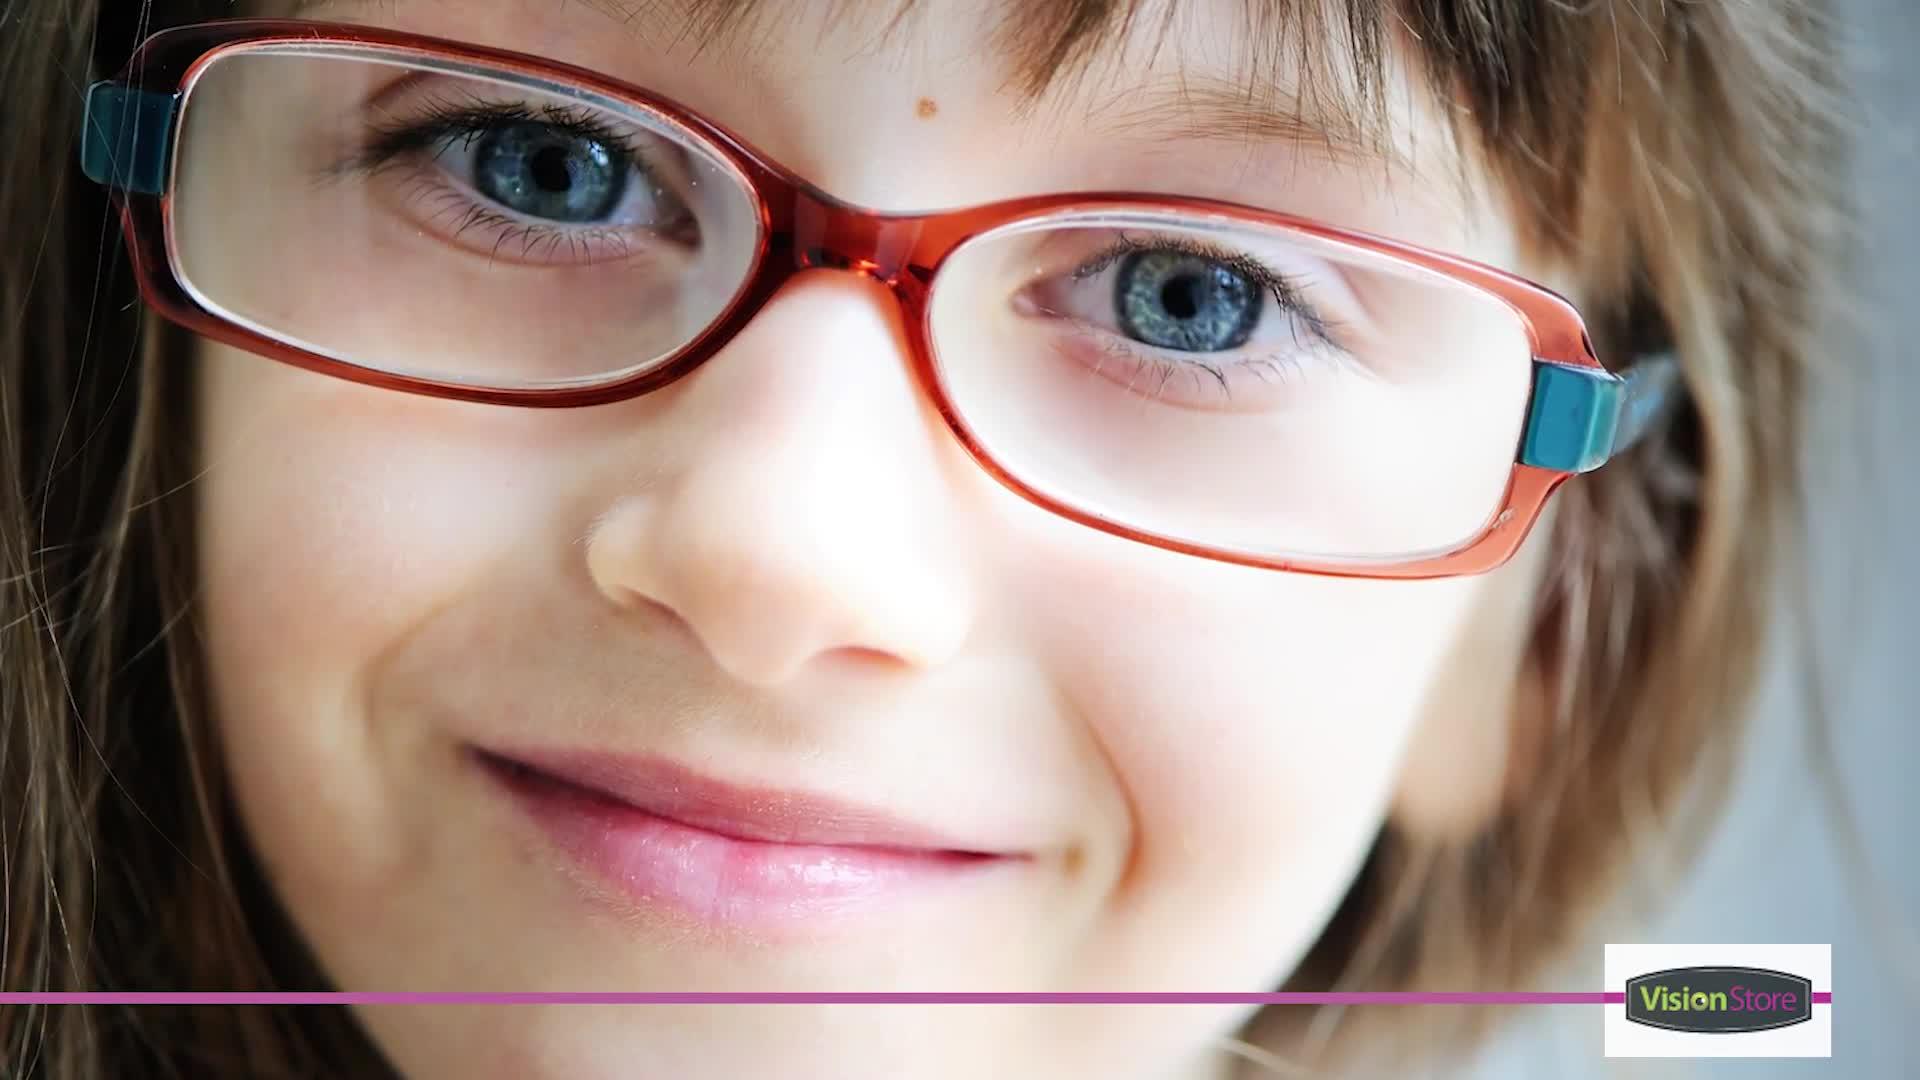 Vision Store - Optometrists - 705-726-2020